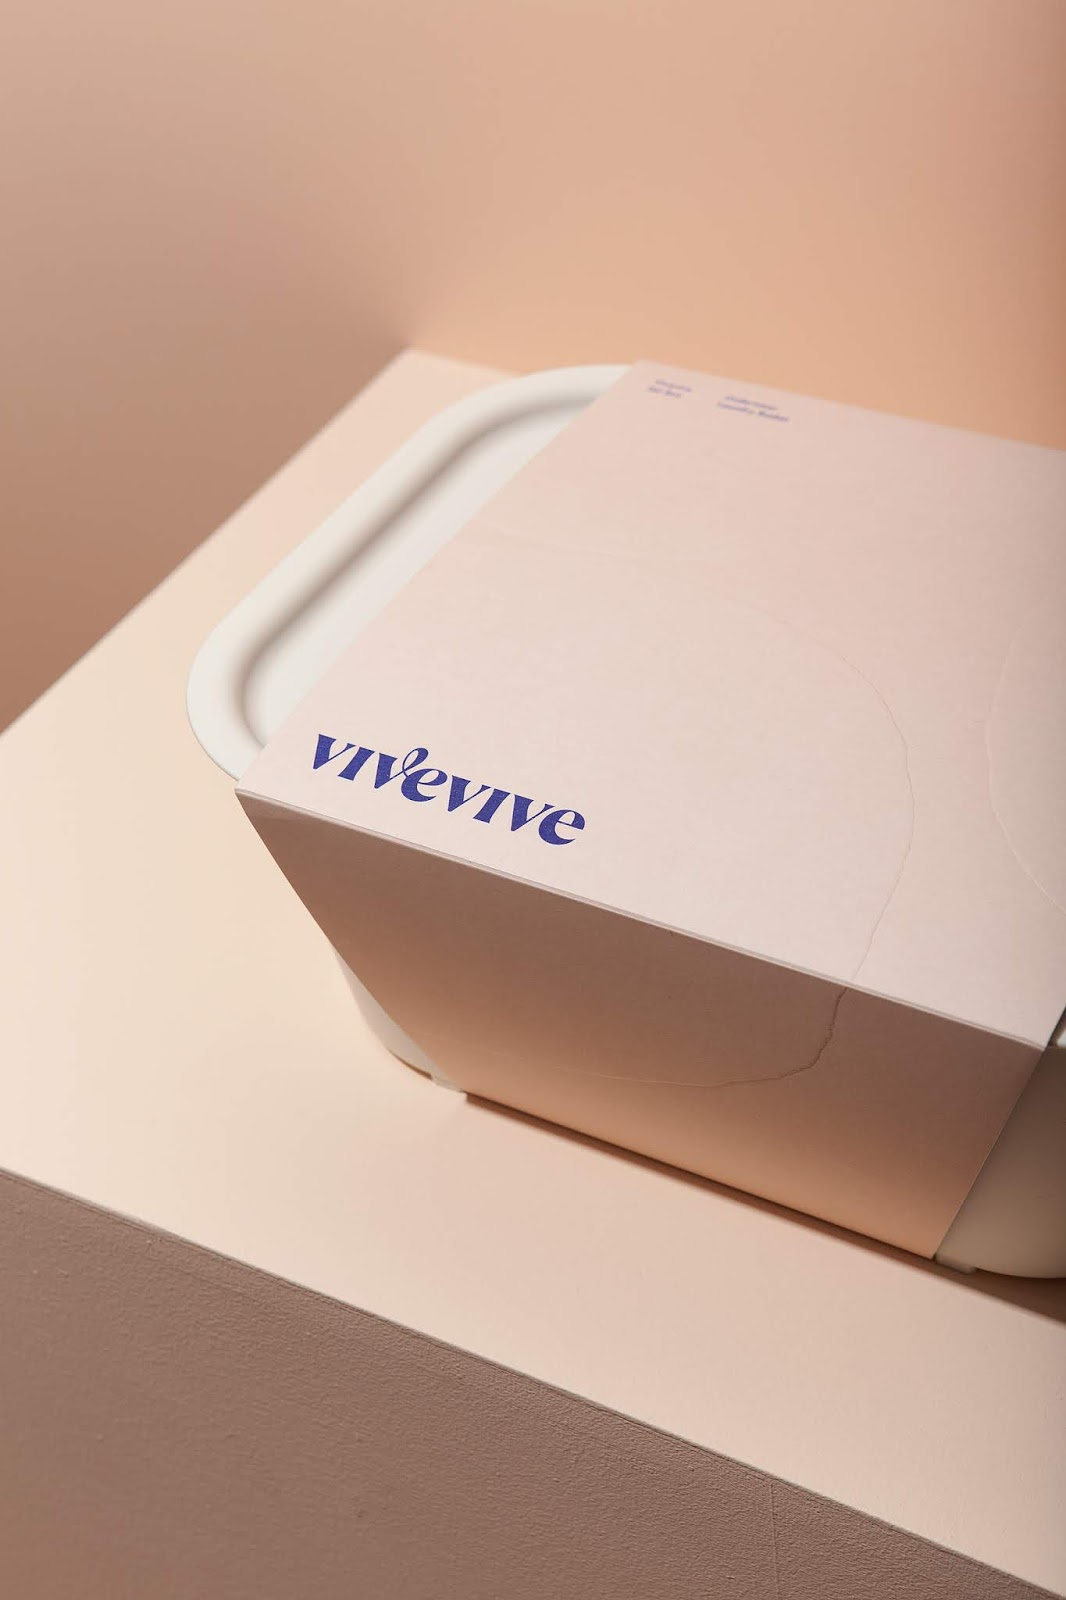 vivevive内衣品牌包装设计